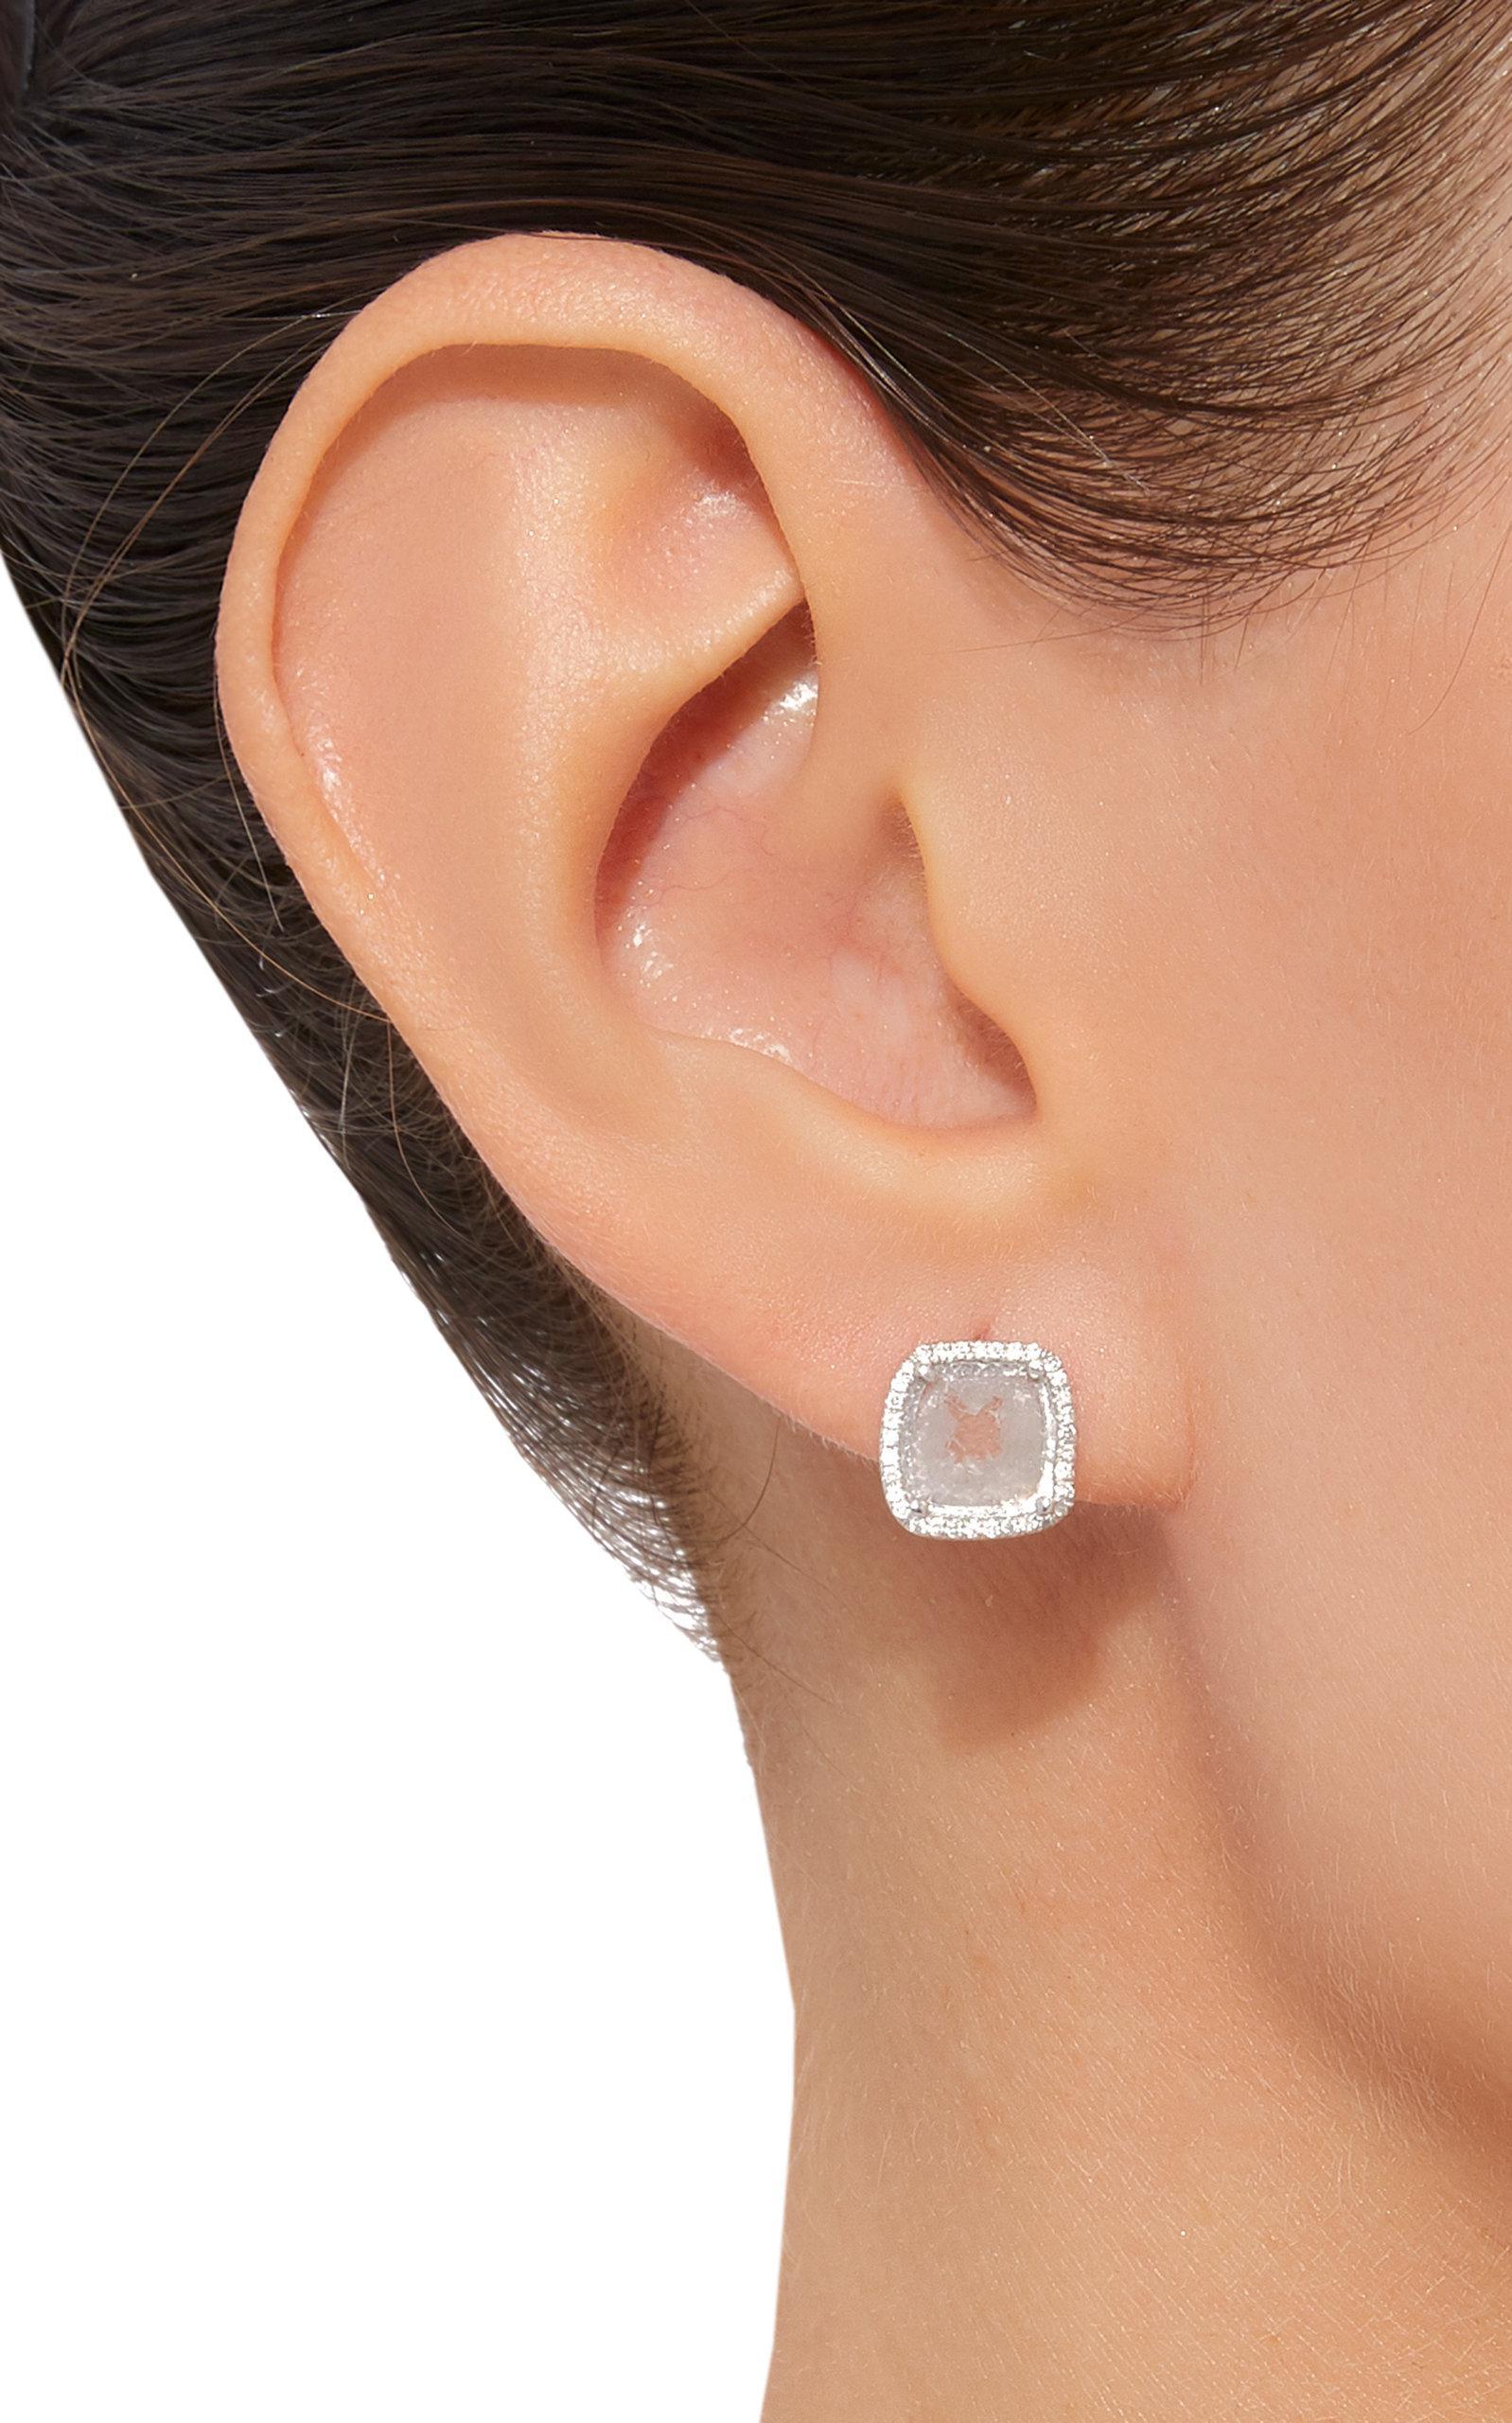 Lyst Nina Runsdorf M o Exclusive e of a kind Slice Diamond Stud